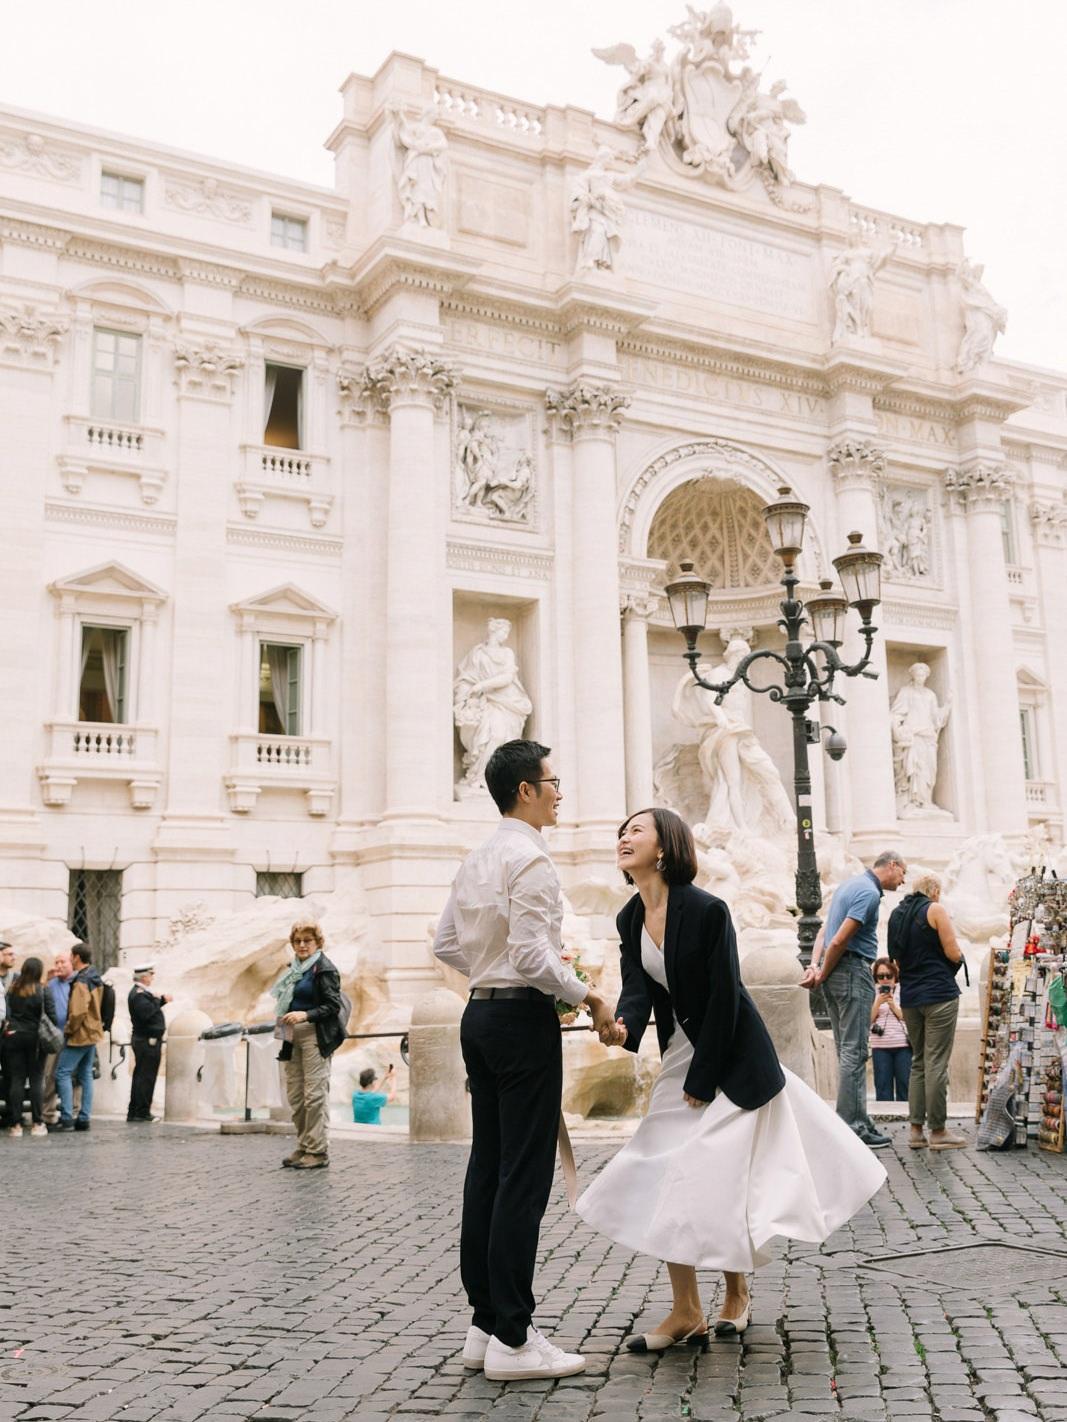 037_rome_engagement_prewedding_session_chymo_more_photography.jpg